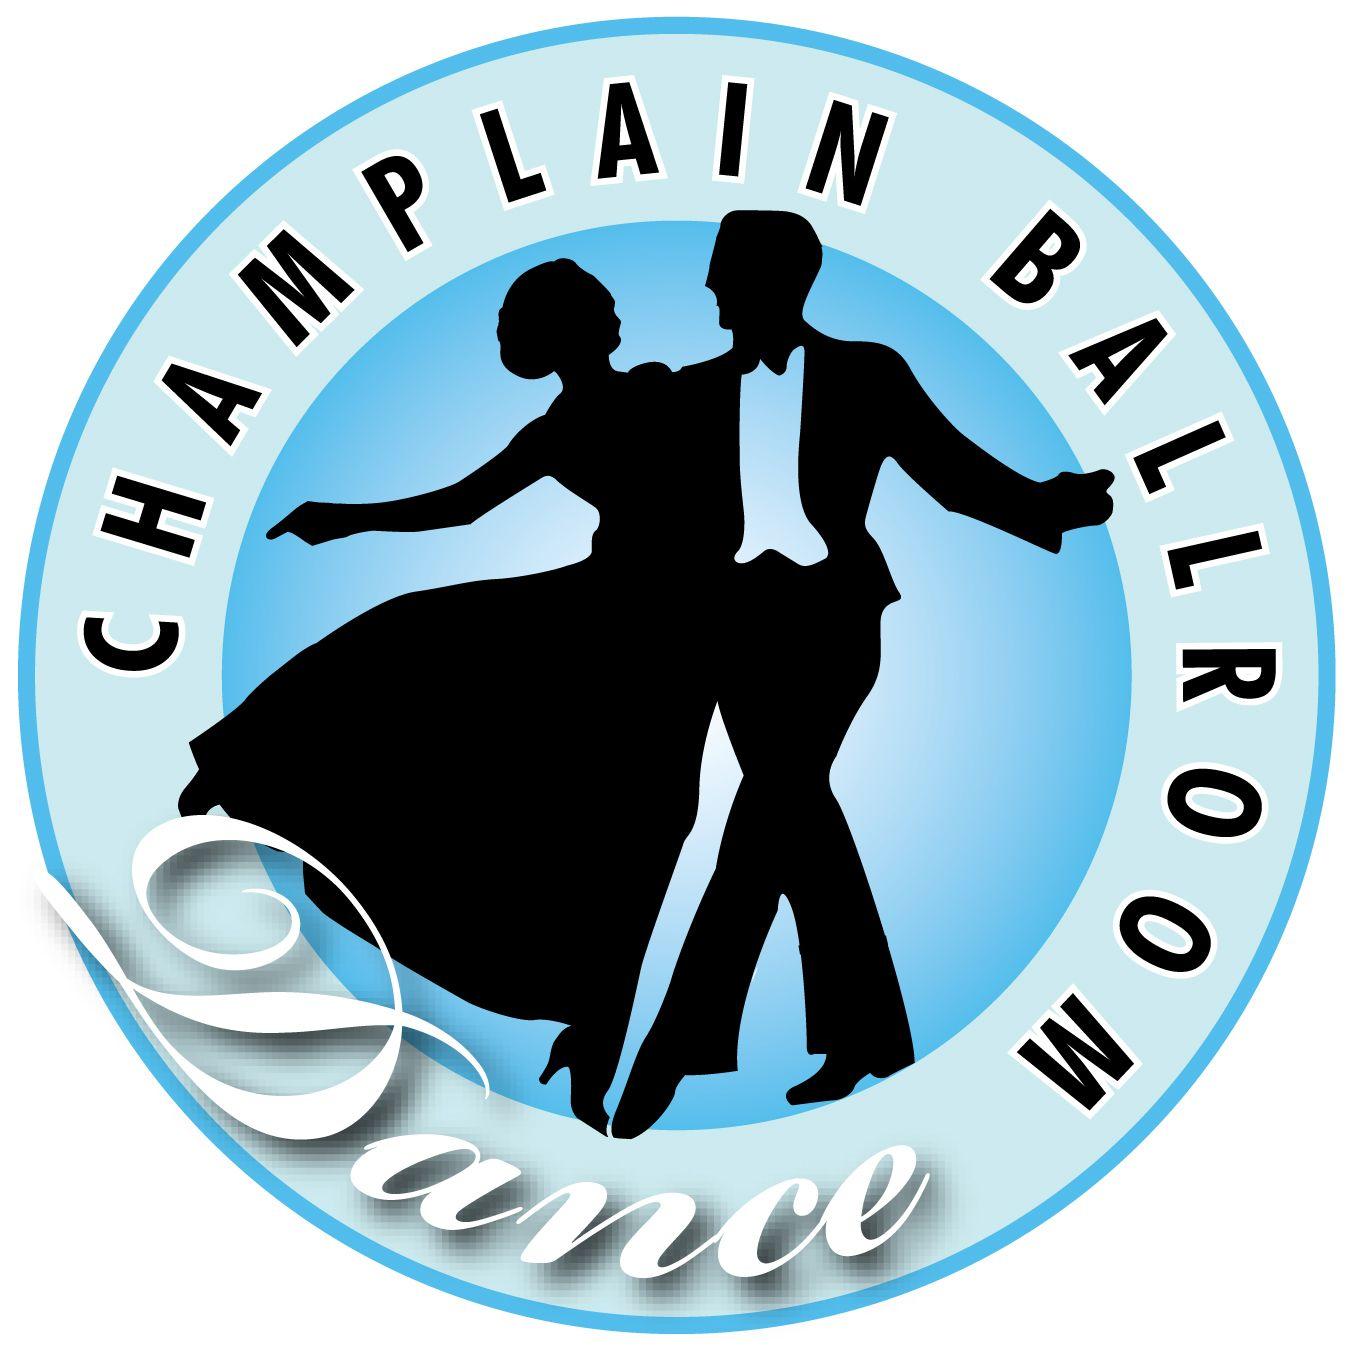 Champlain Ballroom Dance Studio logo (With images